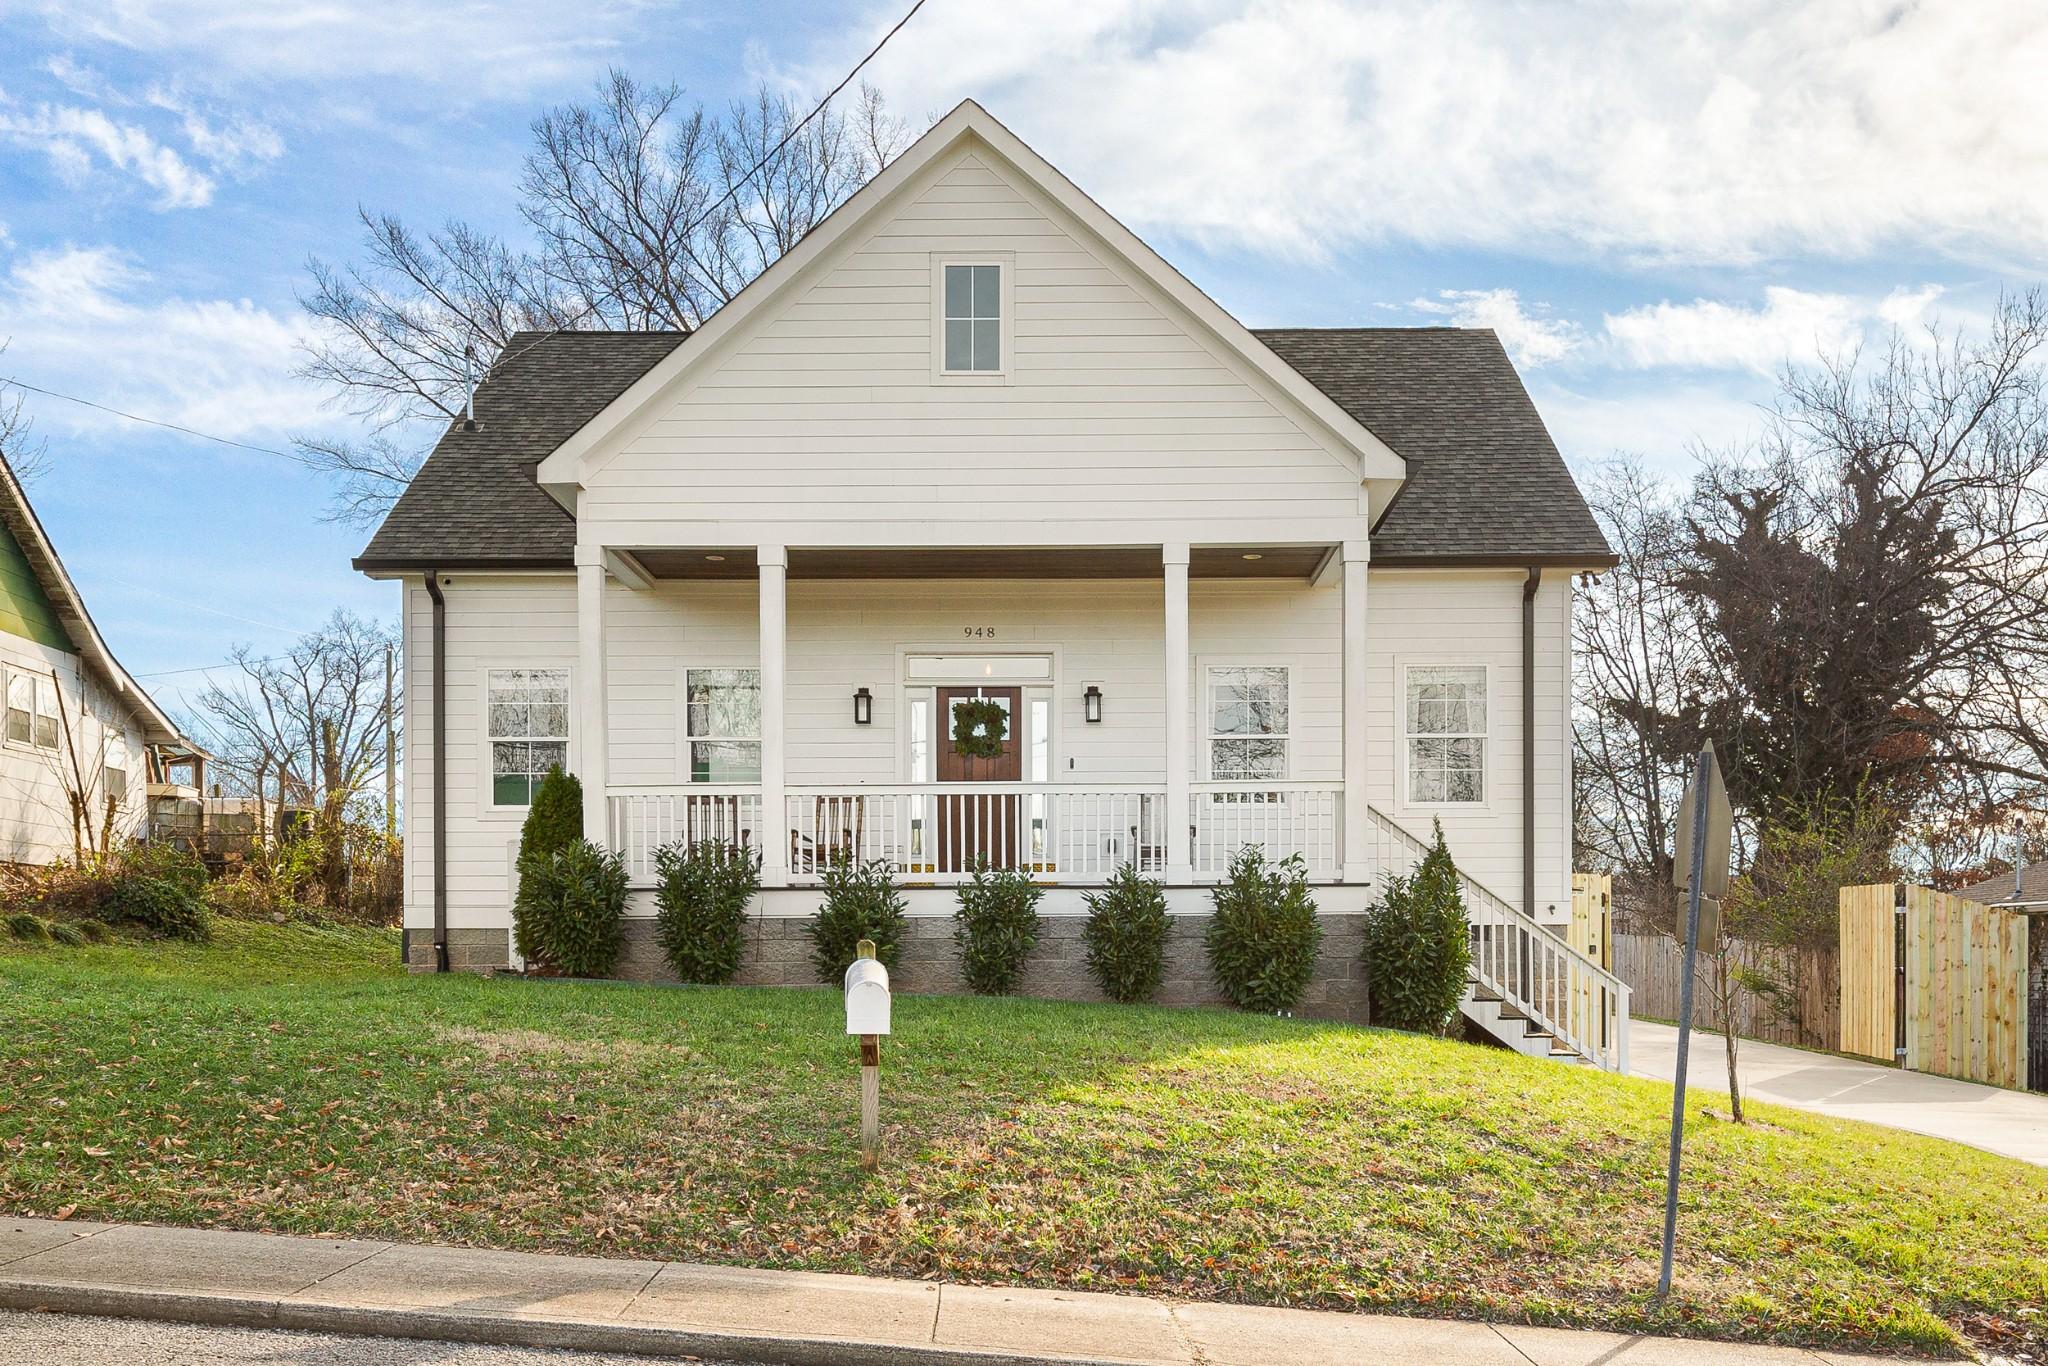 948 W Greenwood Ave, Nashville, TN 37206 - Nashville, TN real estate listing